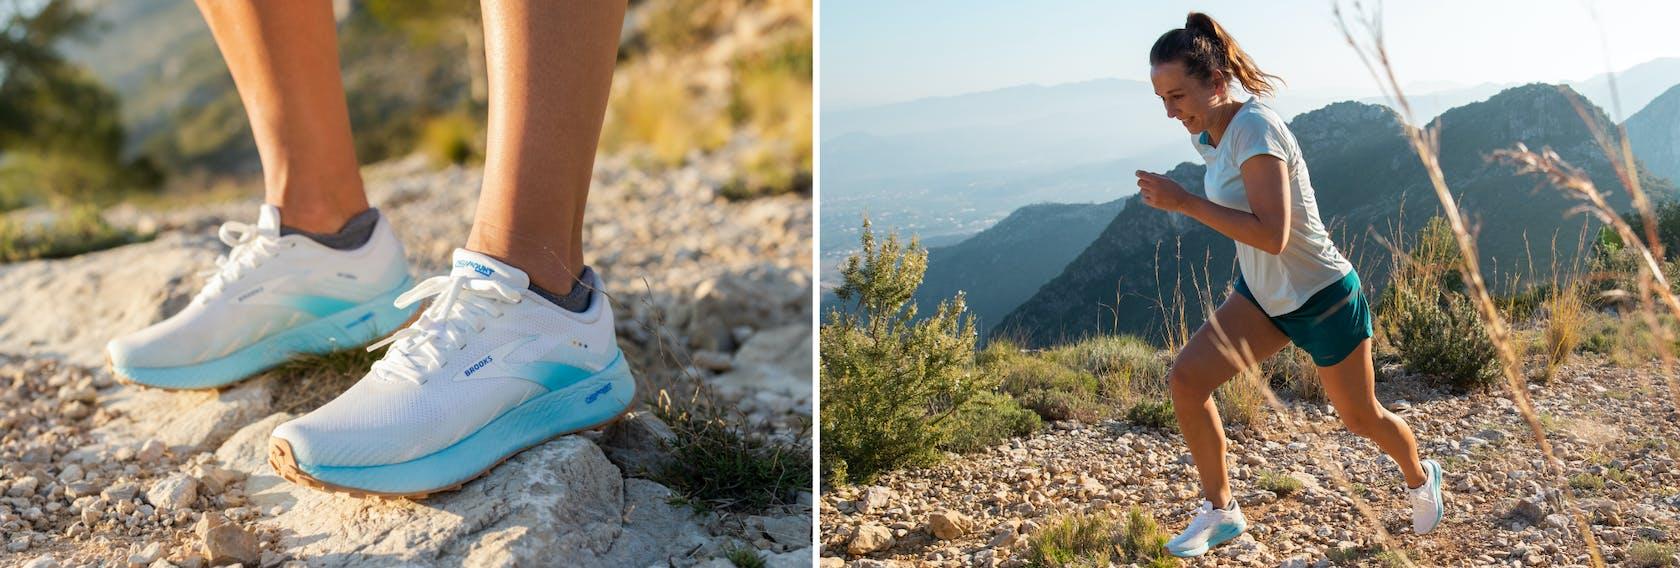 Brooks scarpe trail donna